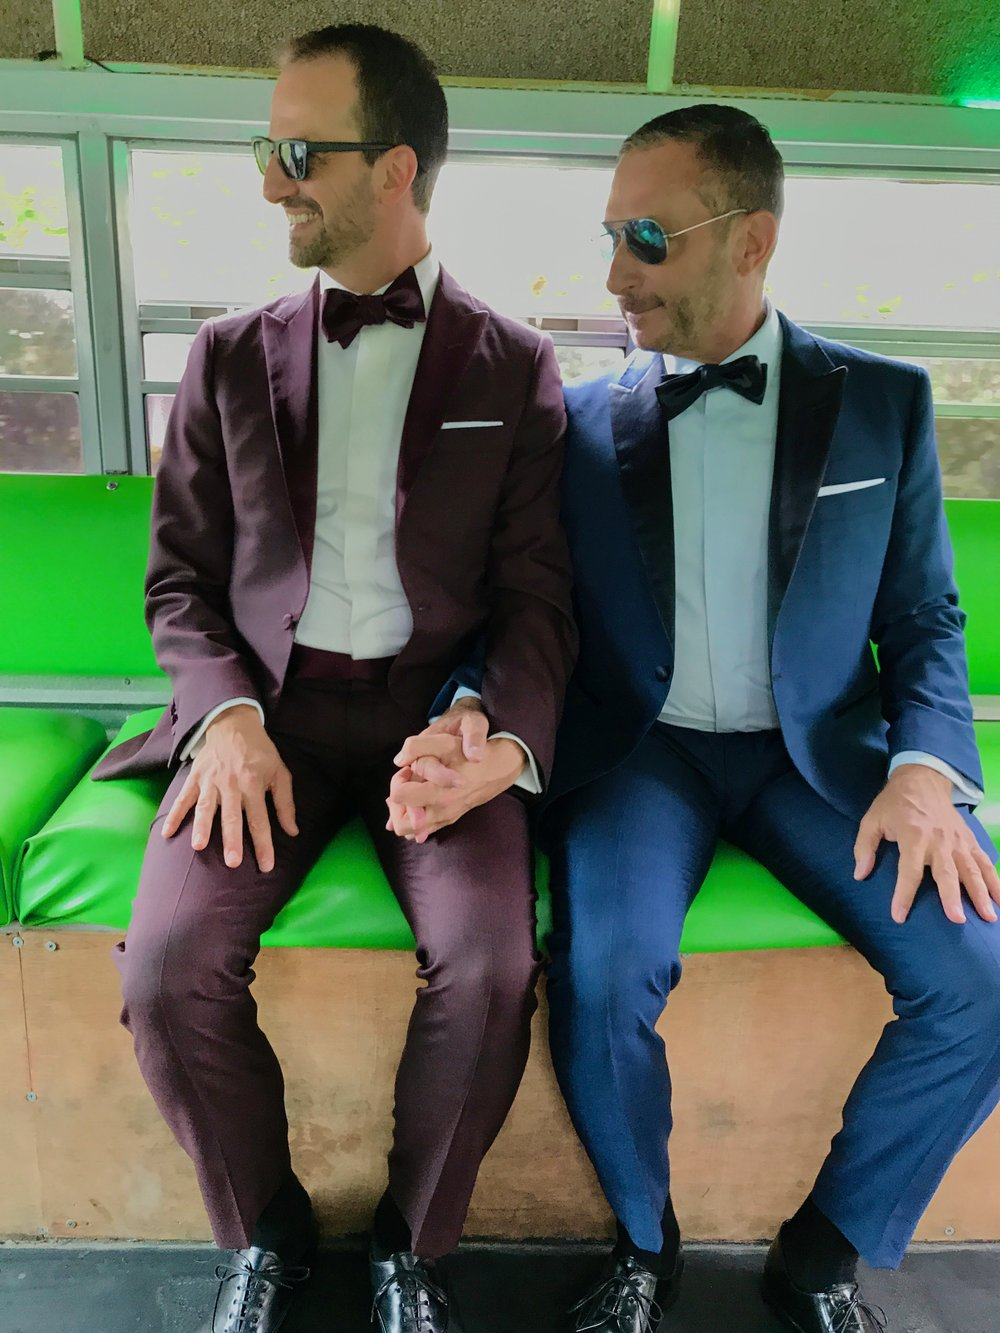 Custom tuxedos for besties wedding!